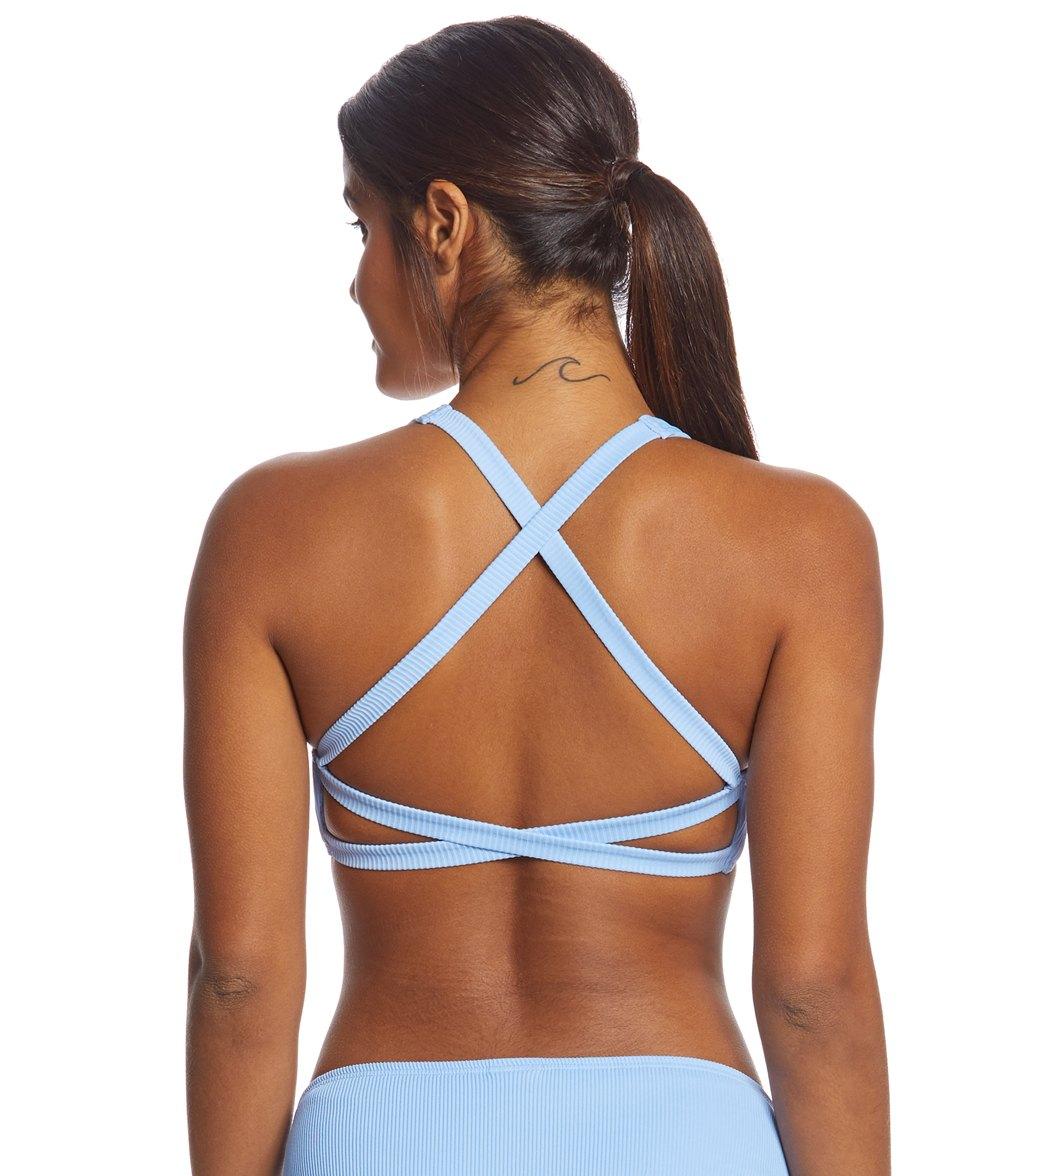 8407c079522d2 Coco Rave Good Vibrations Cyndi Double X-Back Bikini Top (B C D Cup ...